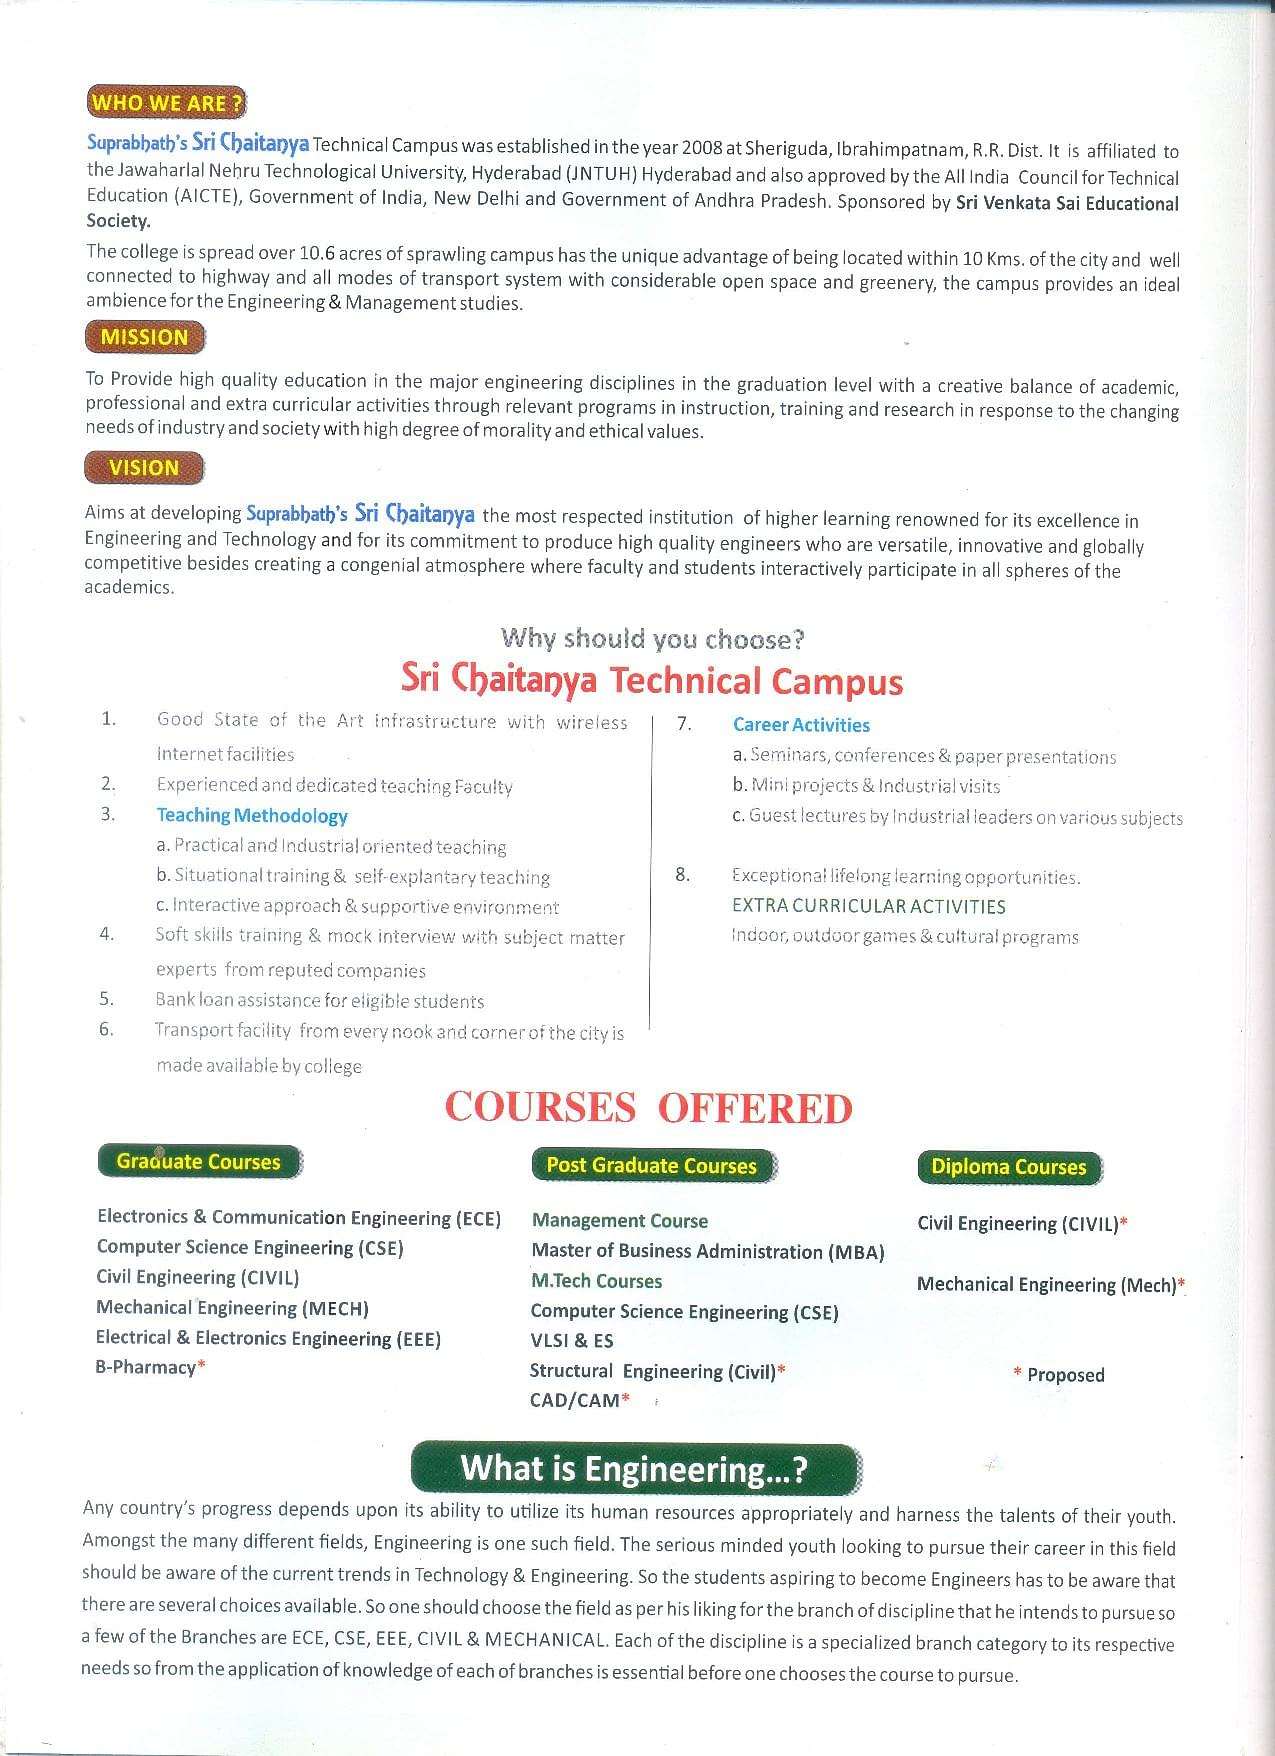 Sri Chaitanya Technical Campus, Rangareddi - Admissions